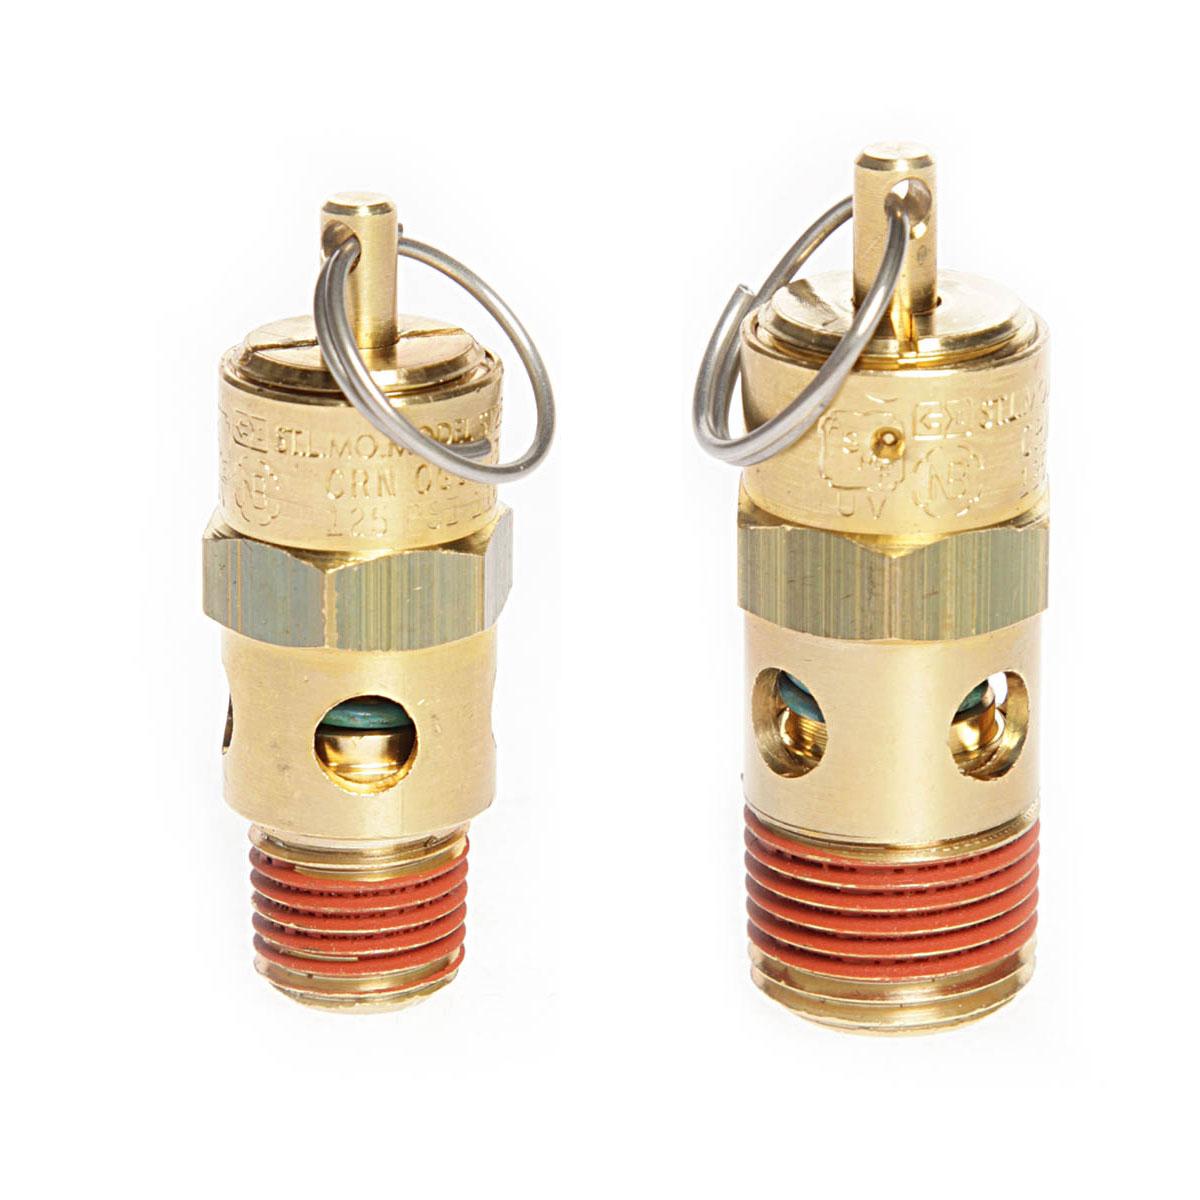 1 4 3 8 Asme Relief Valves Royal Fluid Power Inc